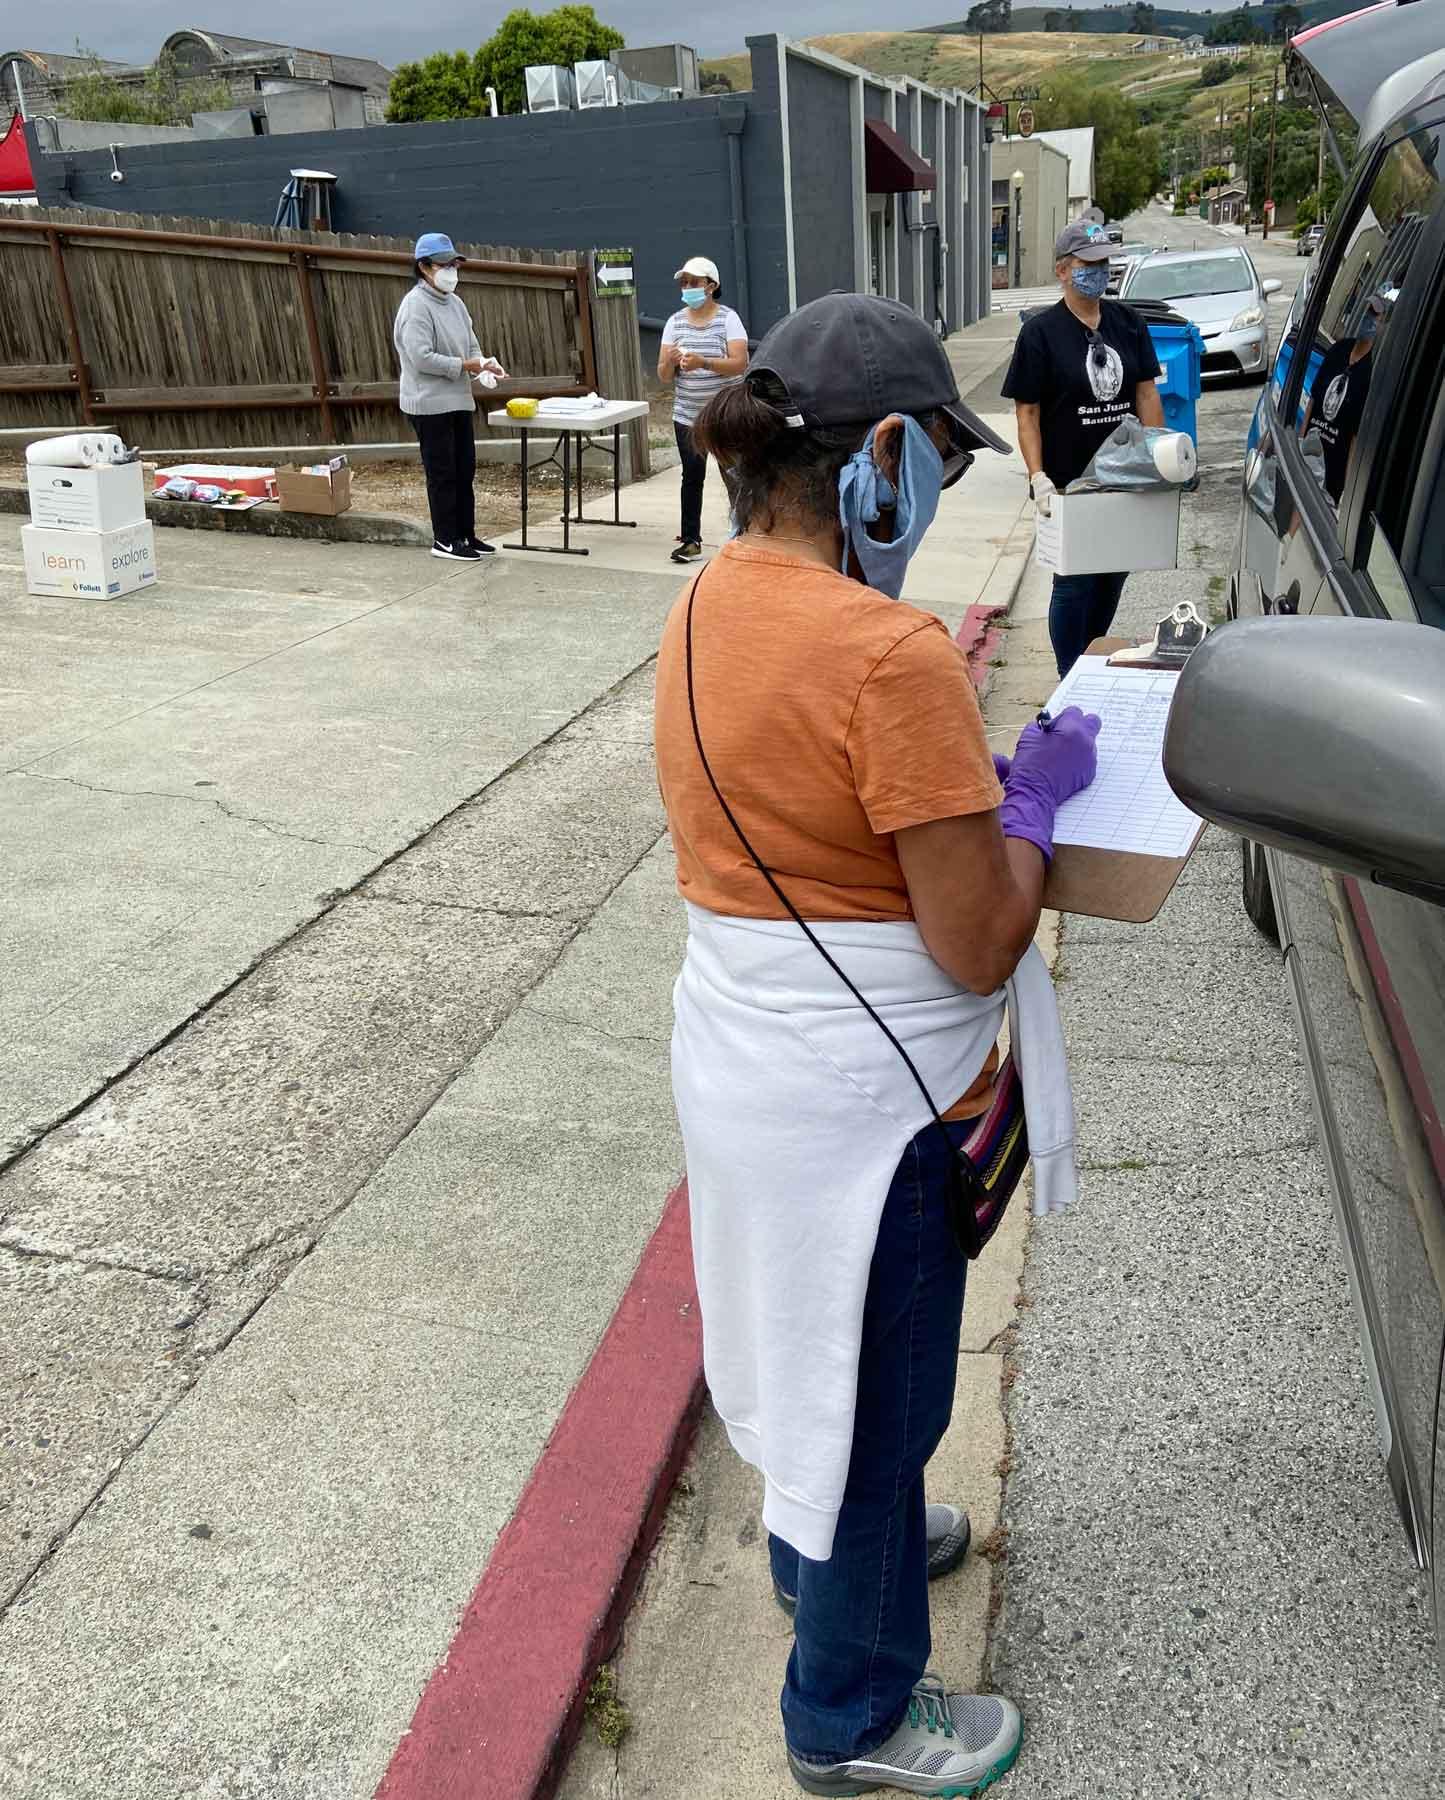 San Juan Mayor Mary Vazquez Edge taking down information. Photo provided by Kollin Kosmicki.